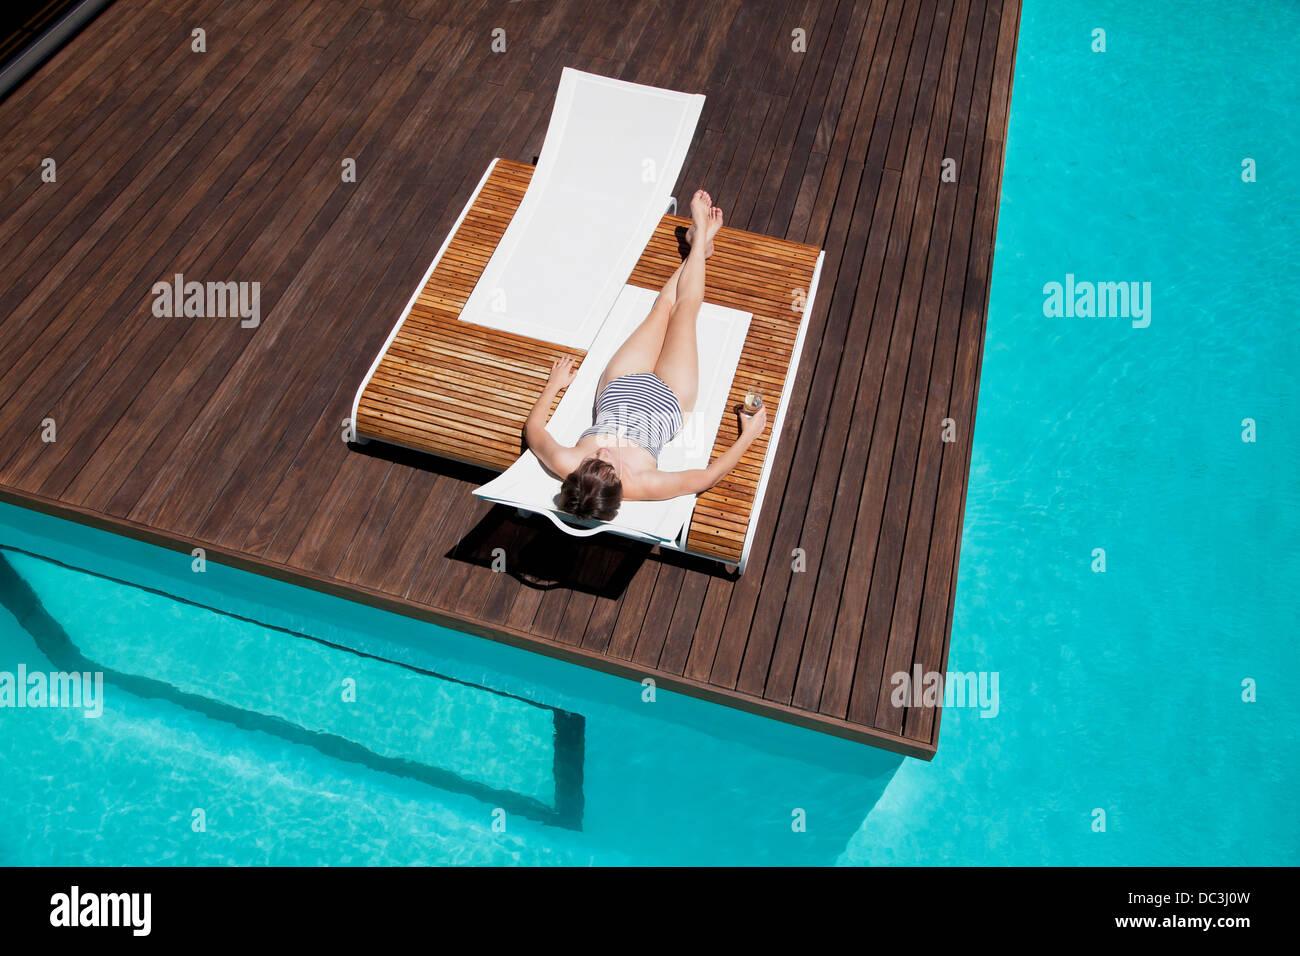 Woman sunbathing at poolside - Stock Image